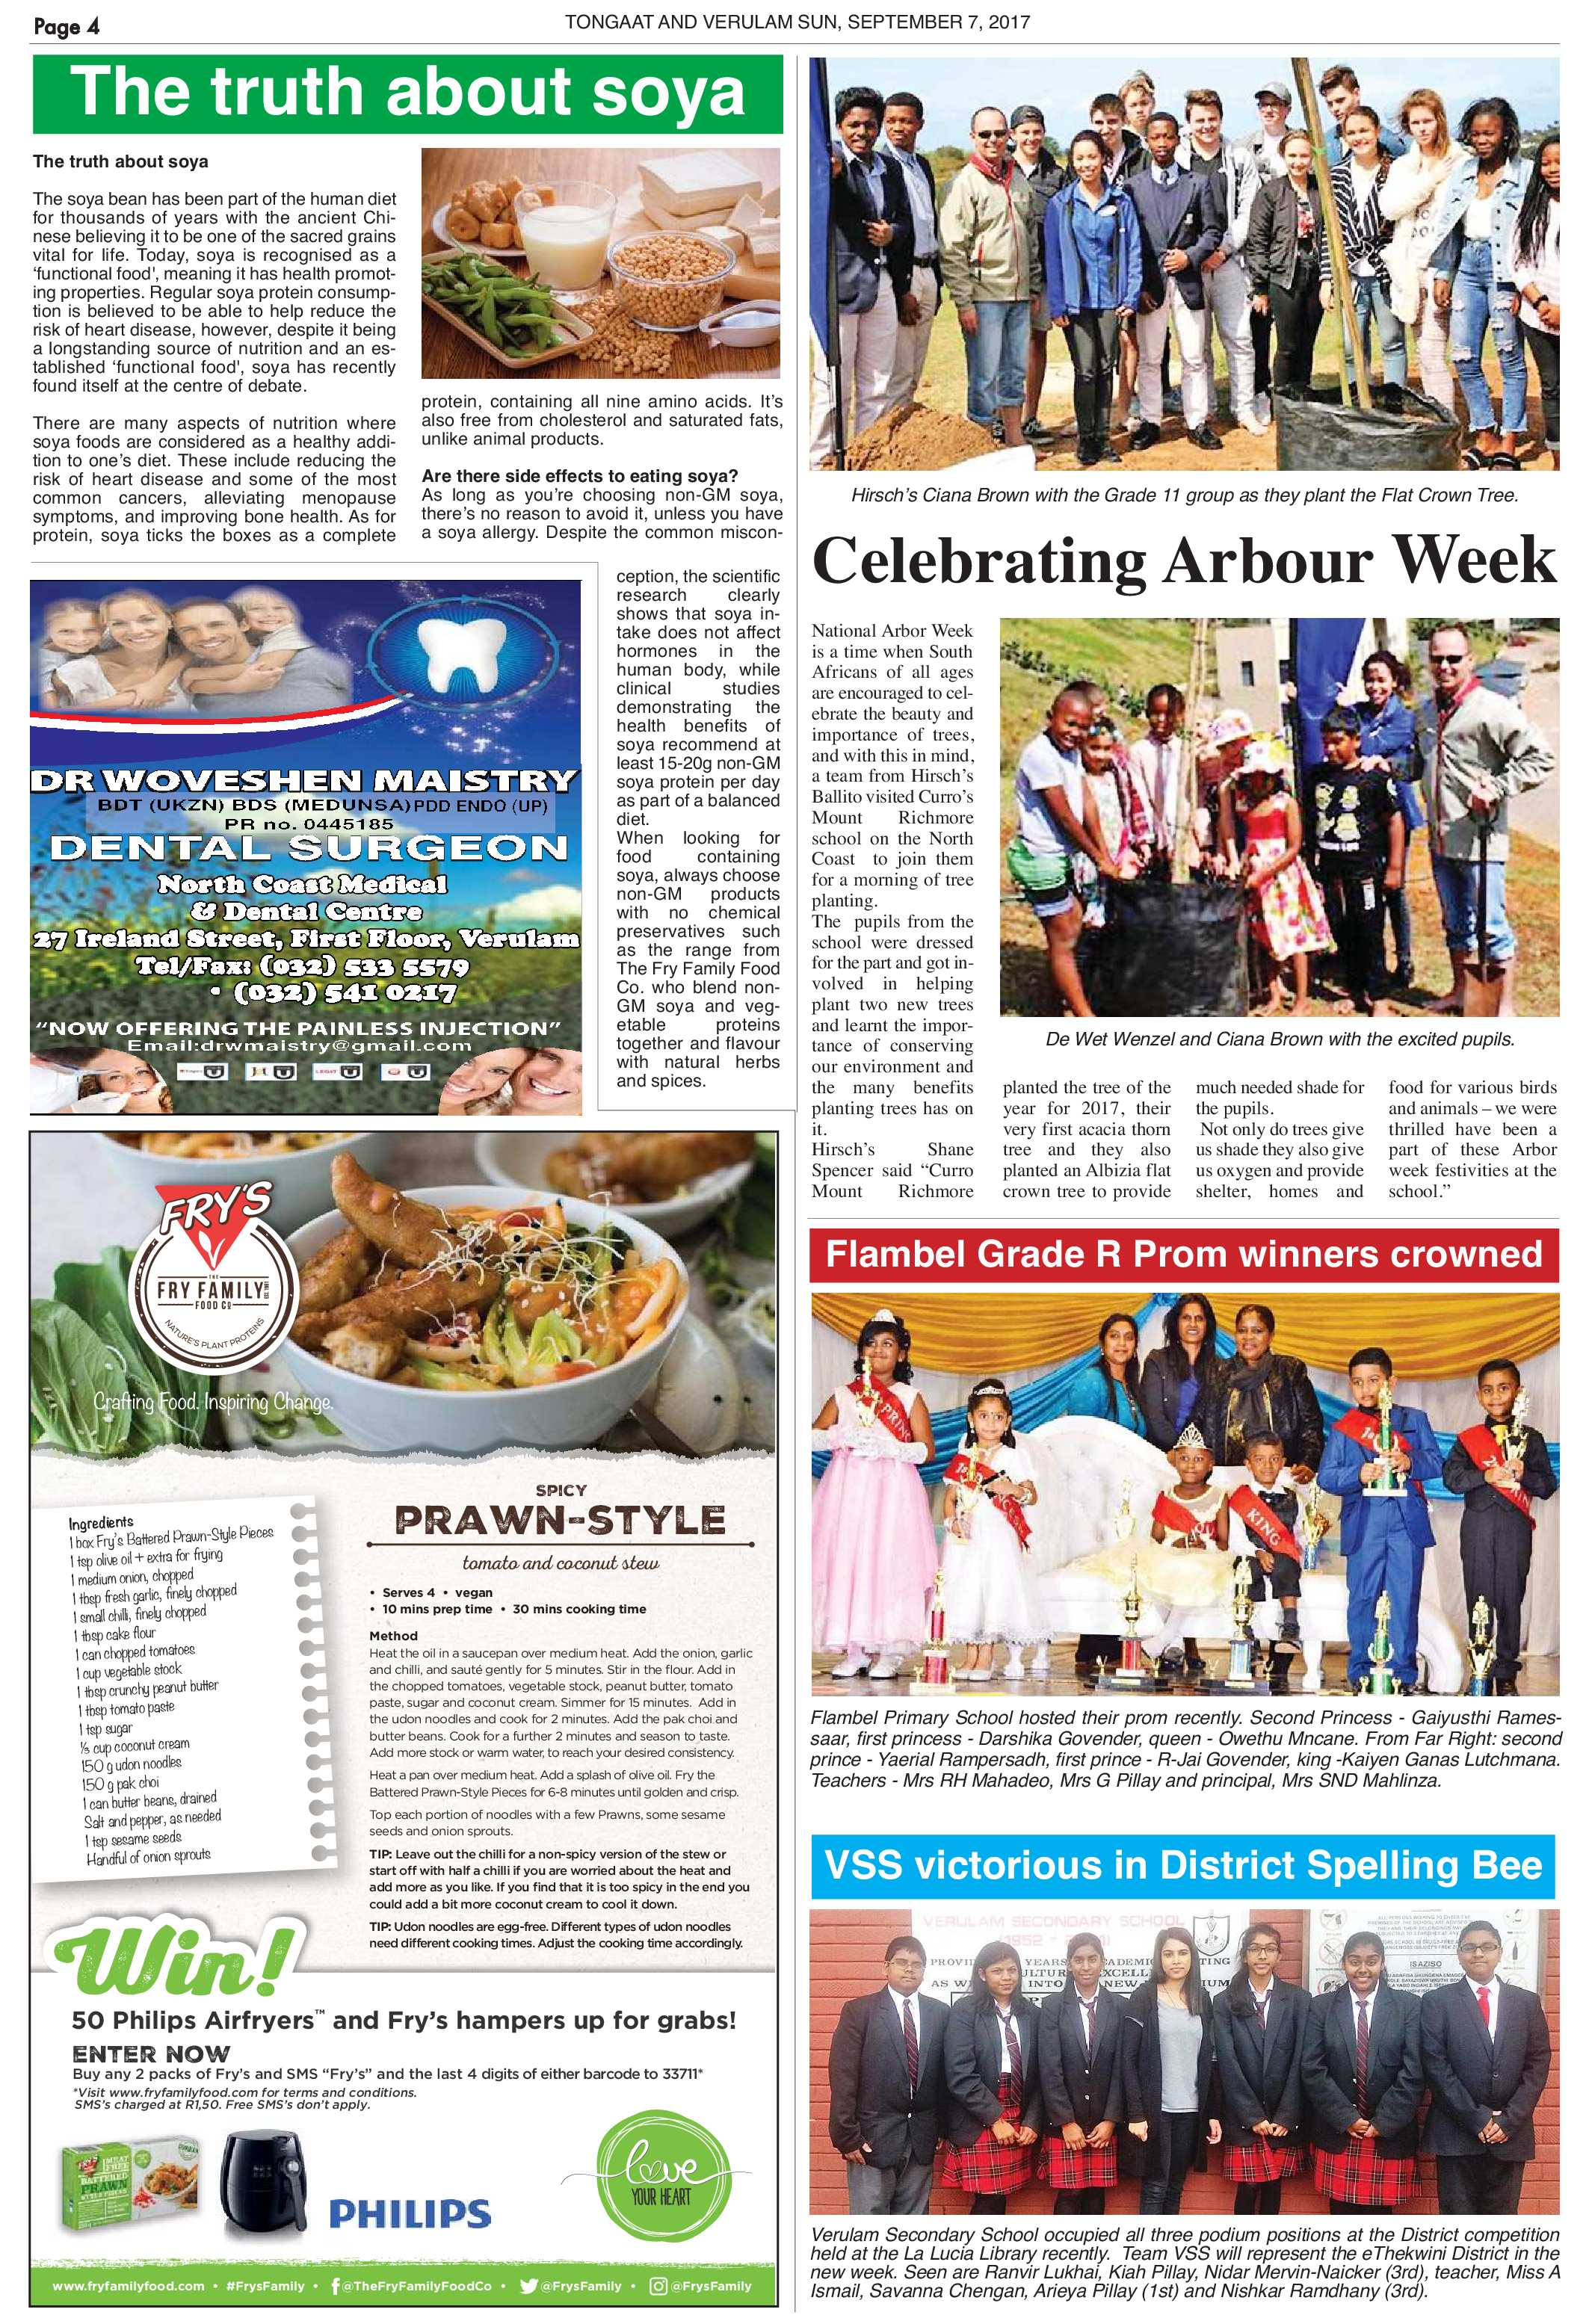 tongaat-verulam-sun-september-7-epapers-page-4